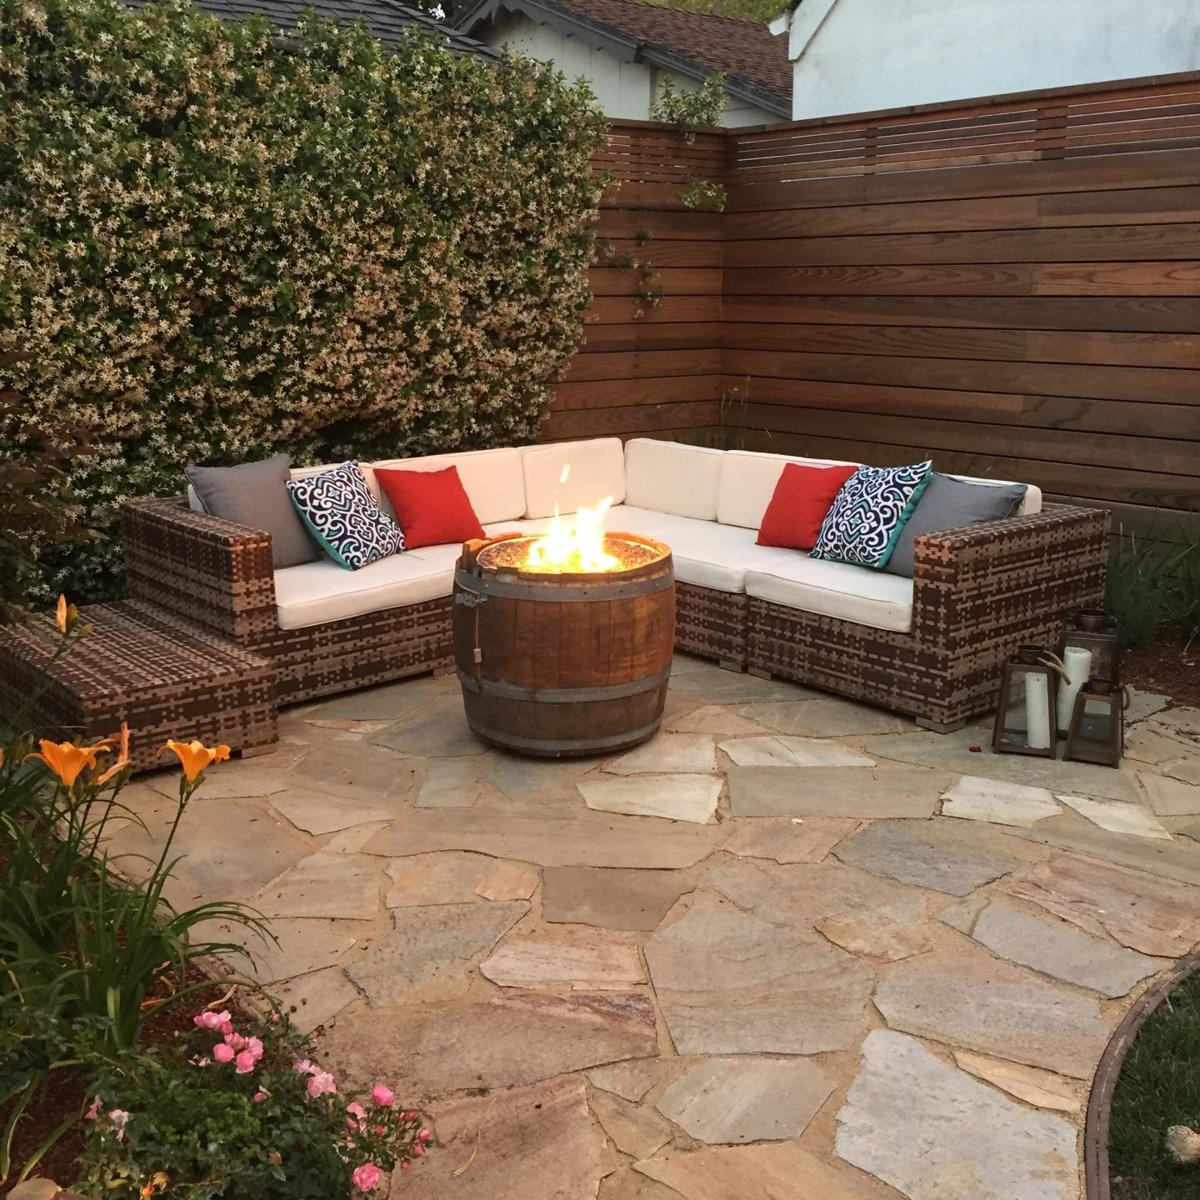 Backyard Fire Pits Extend Patio Season Into Winter Lifestyle